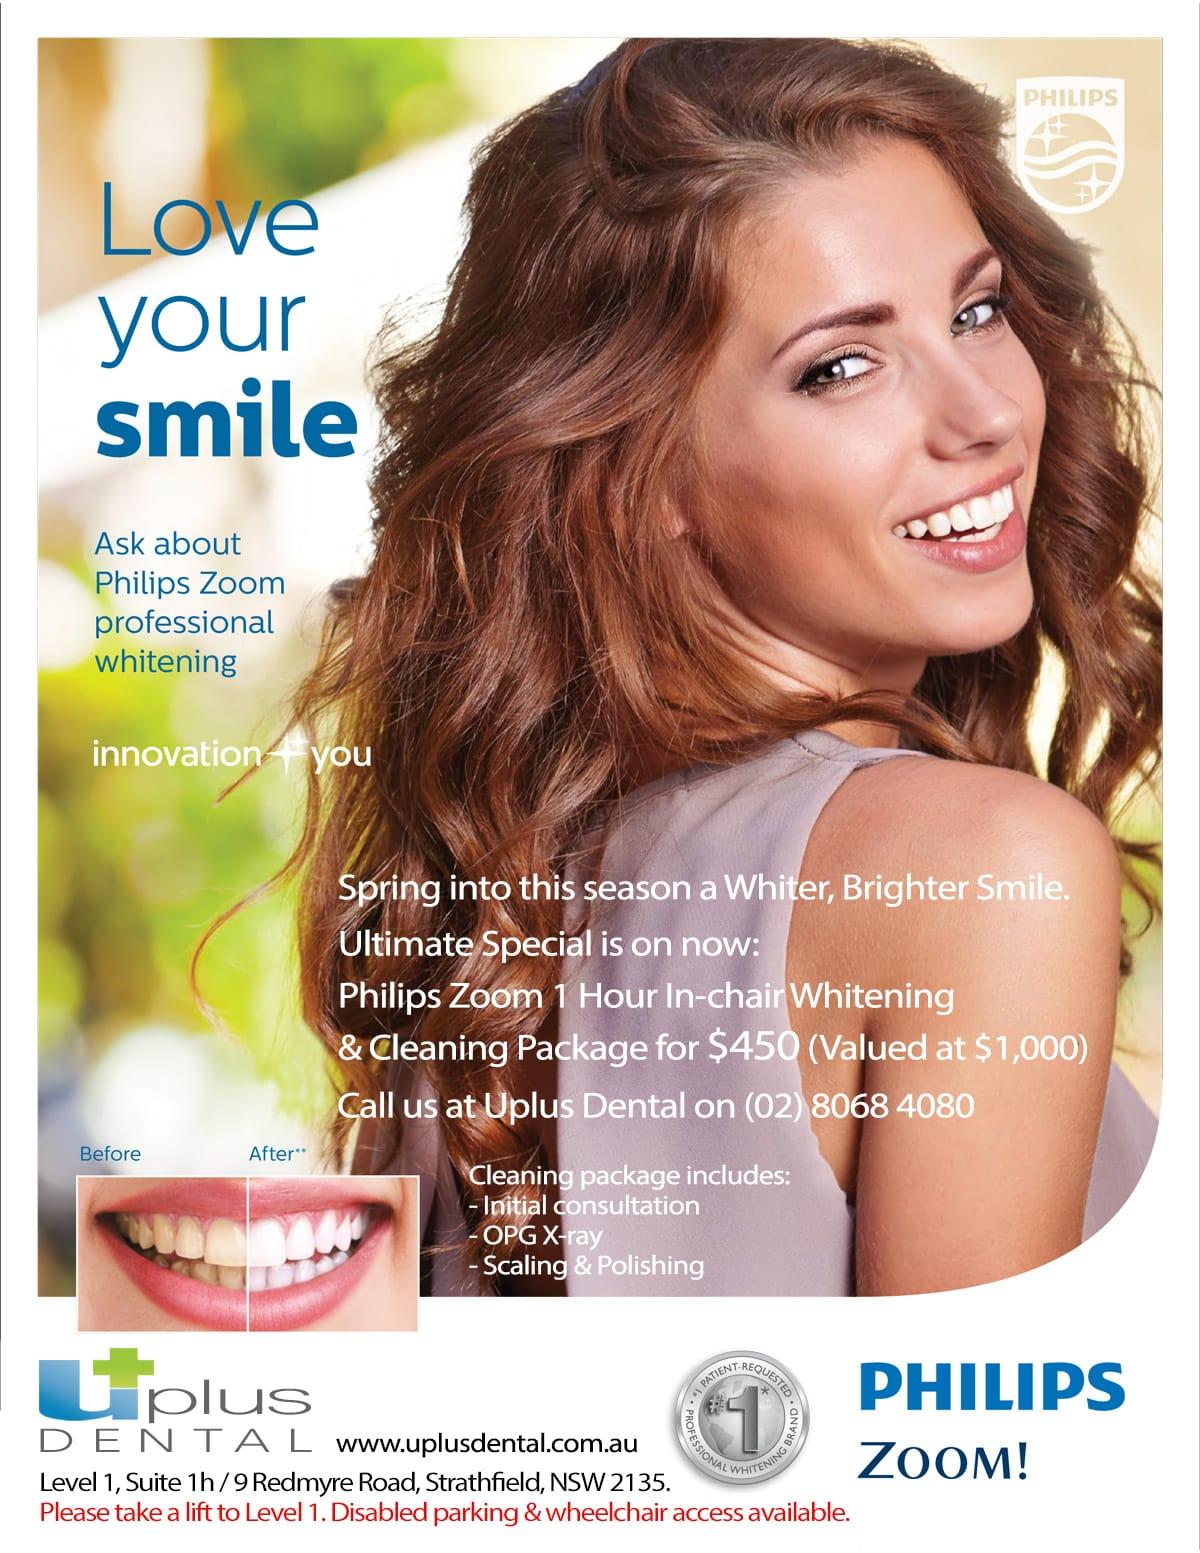 Uplus Dental Philips Zoom Teeth Whitening